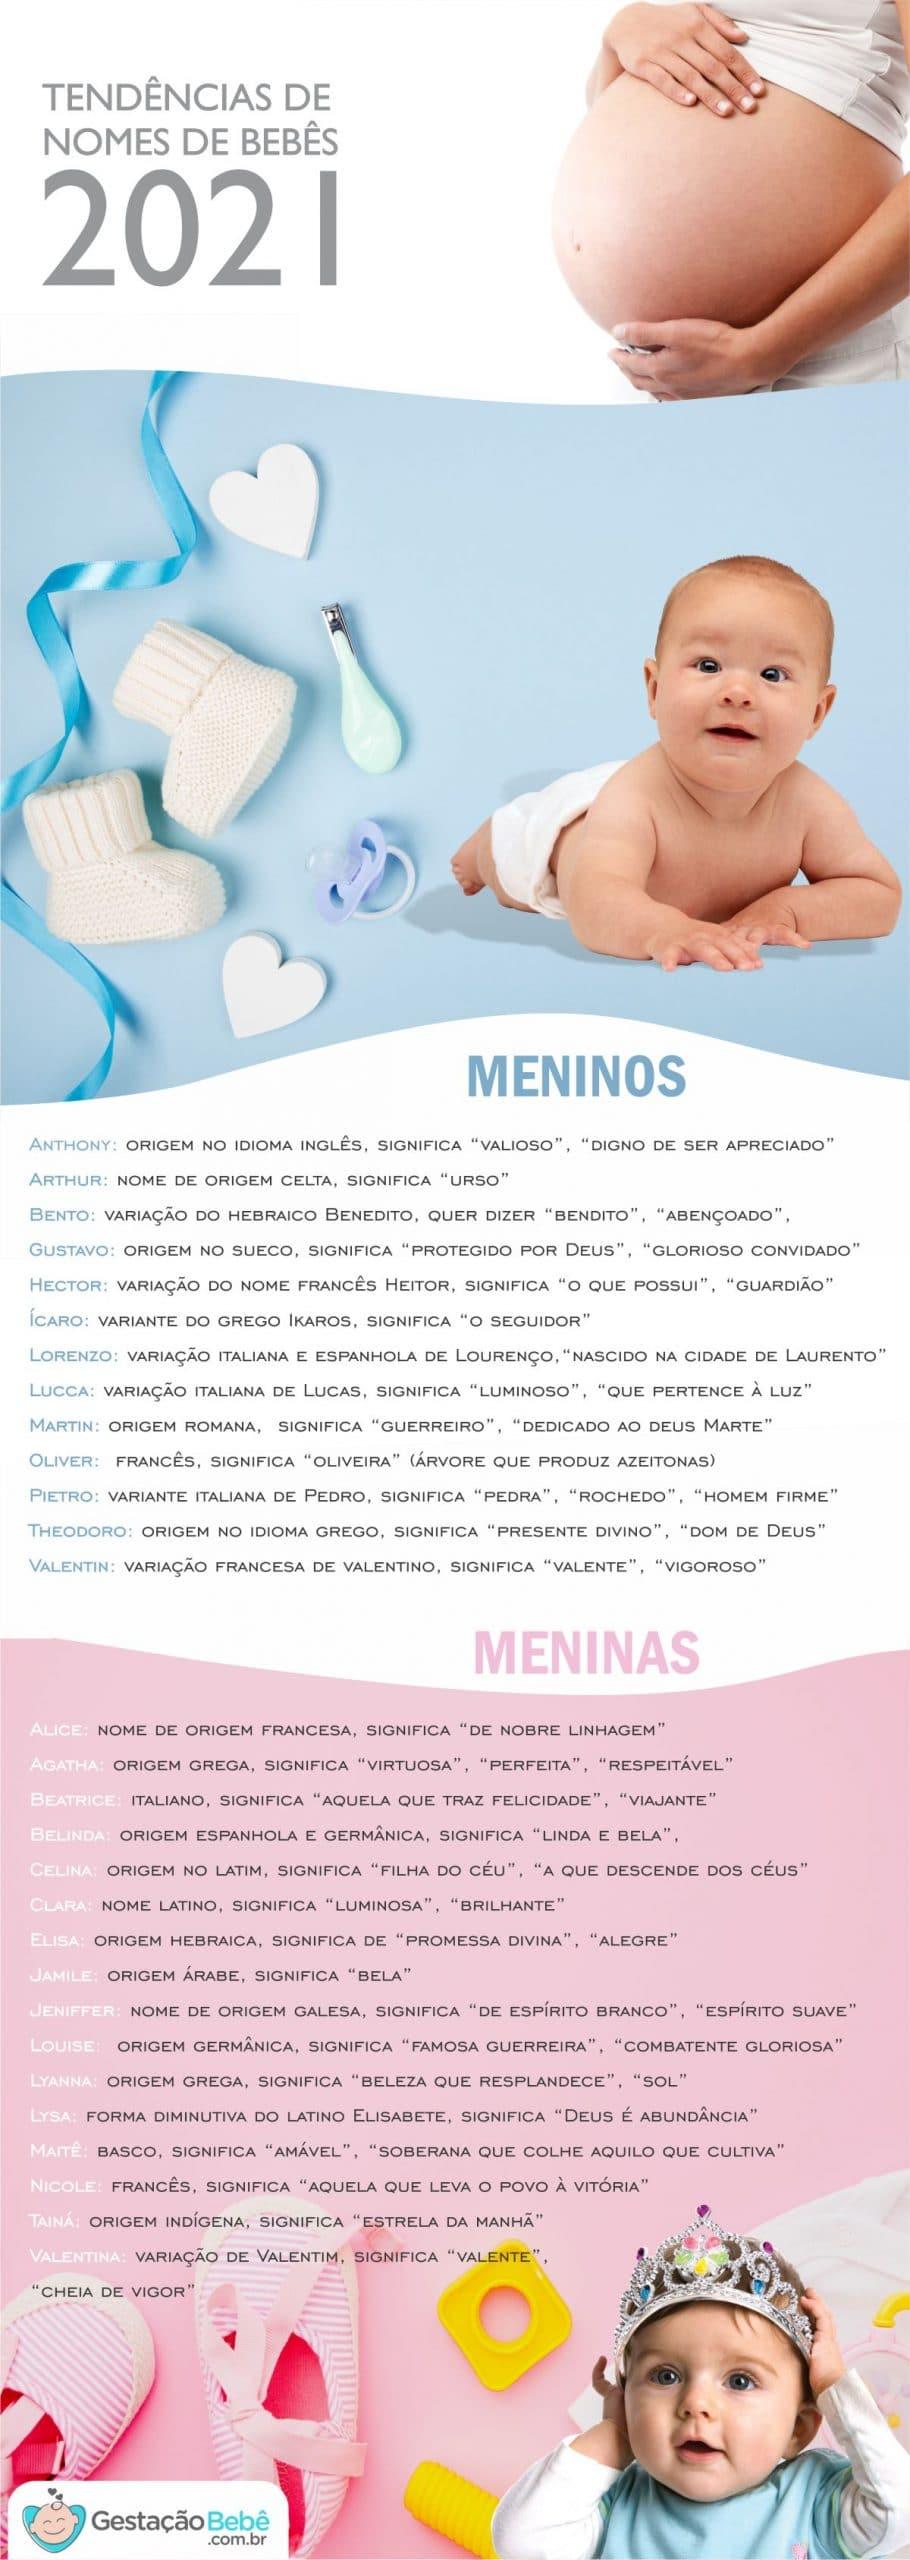 nomes de bebes 2021 meninos e meninas